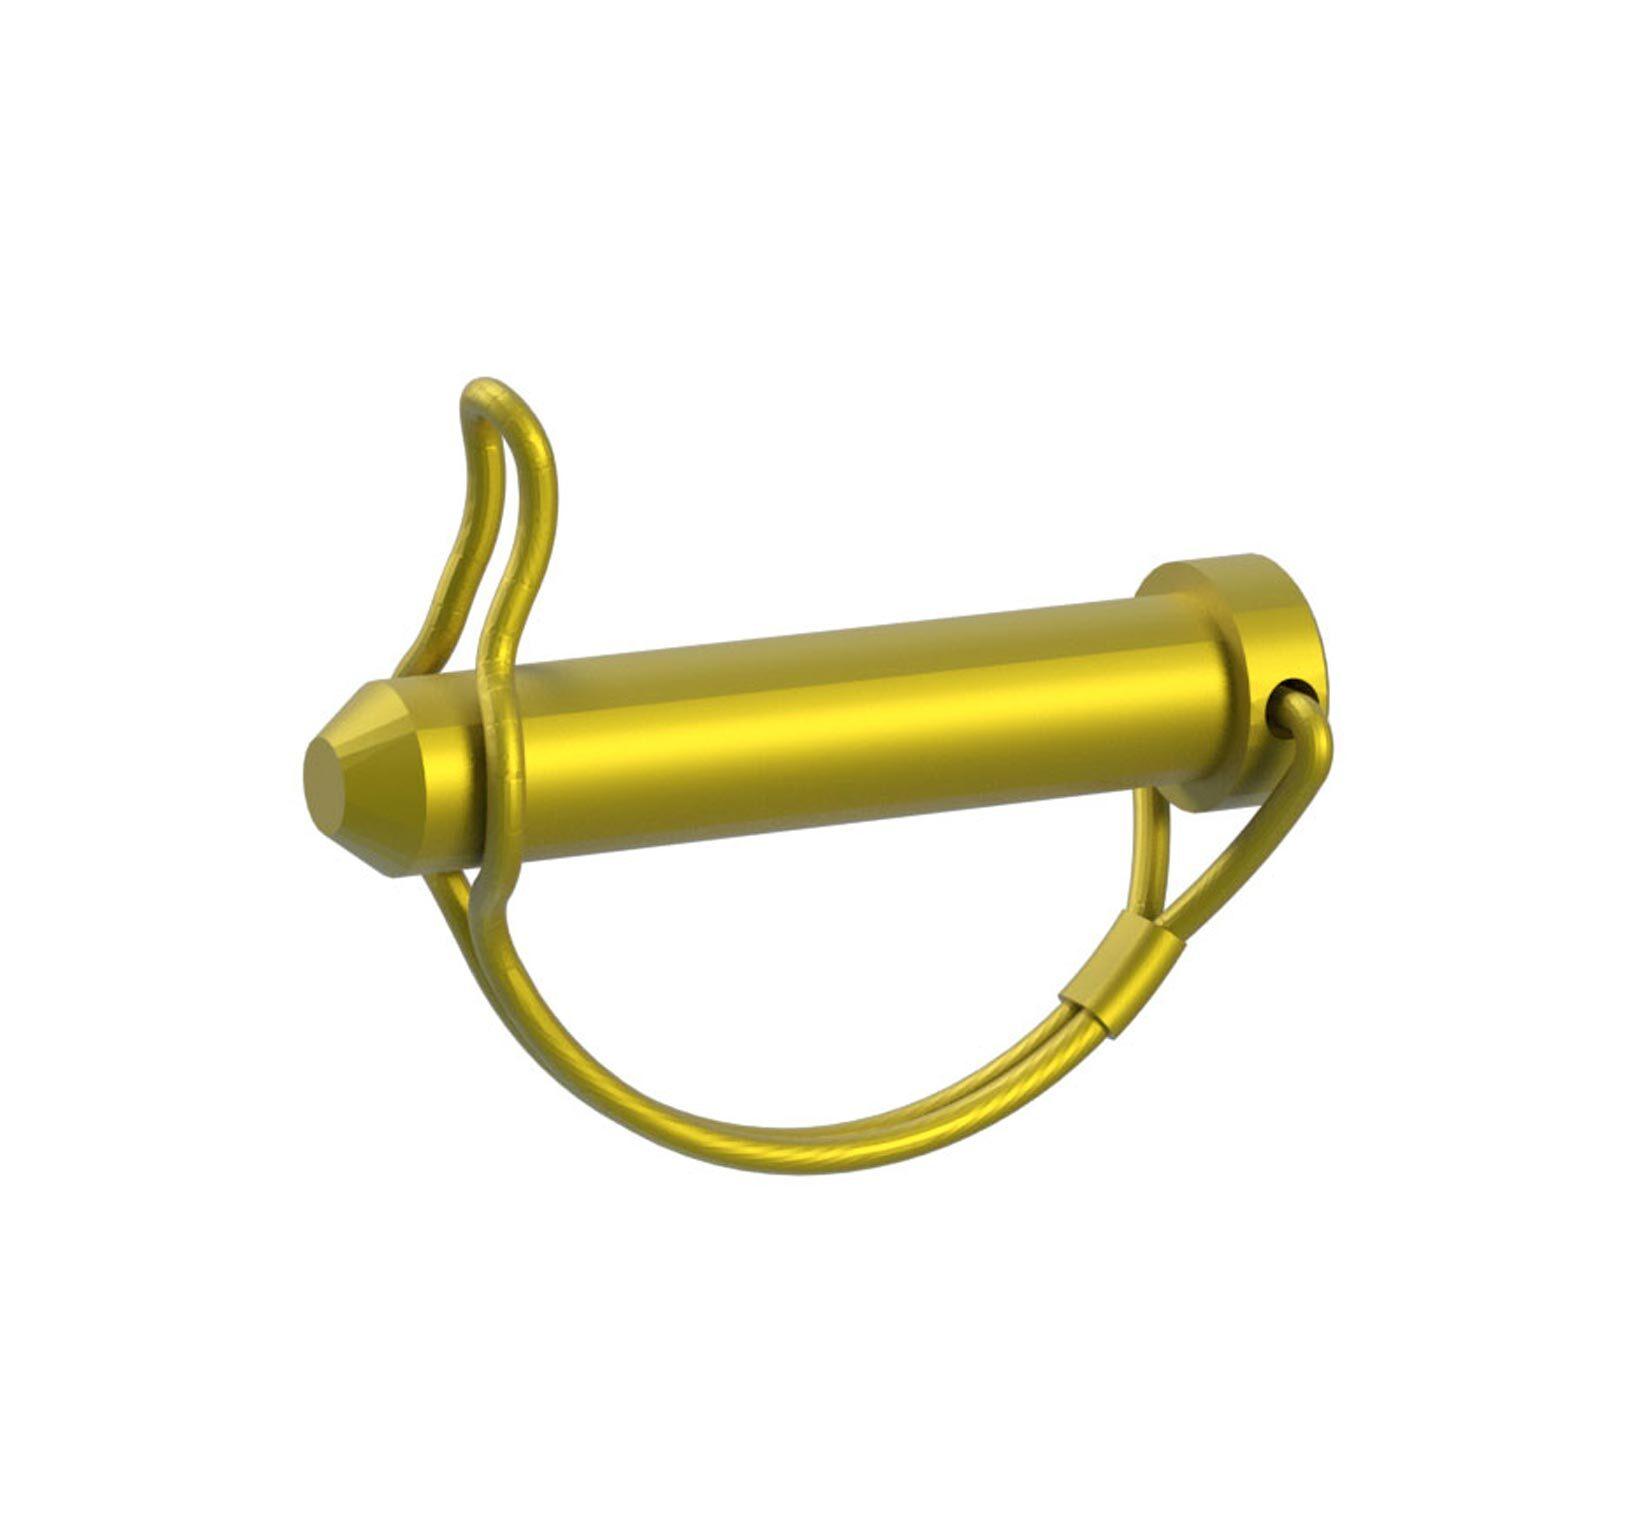 Altrix Quick Release Pin